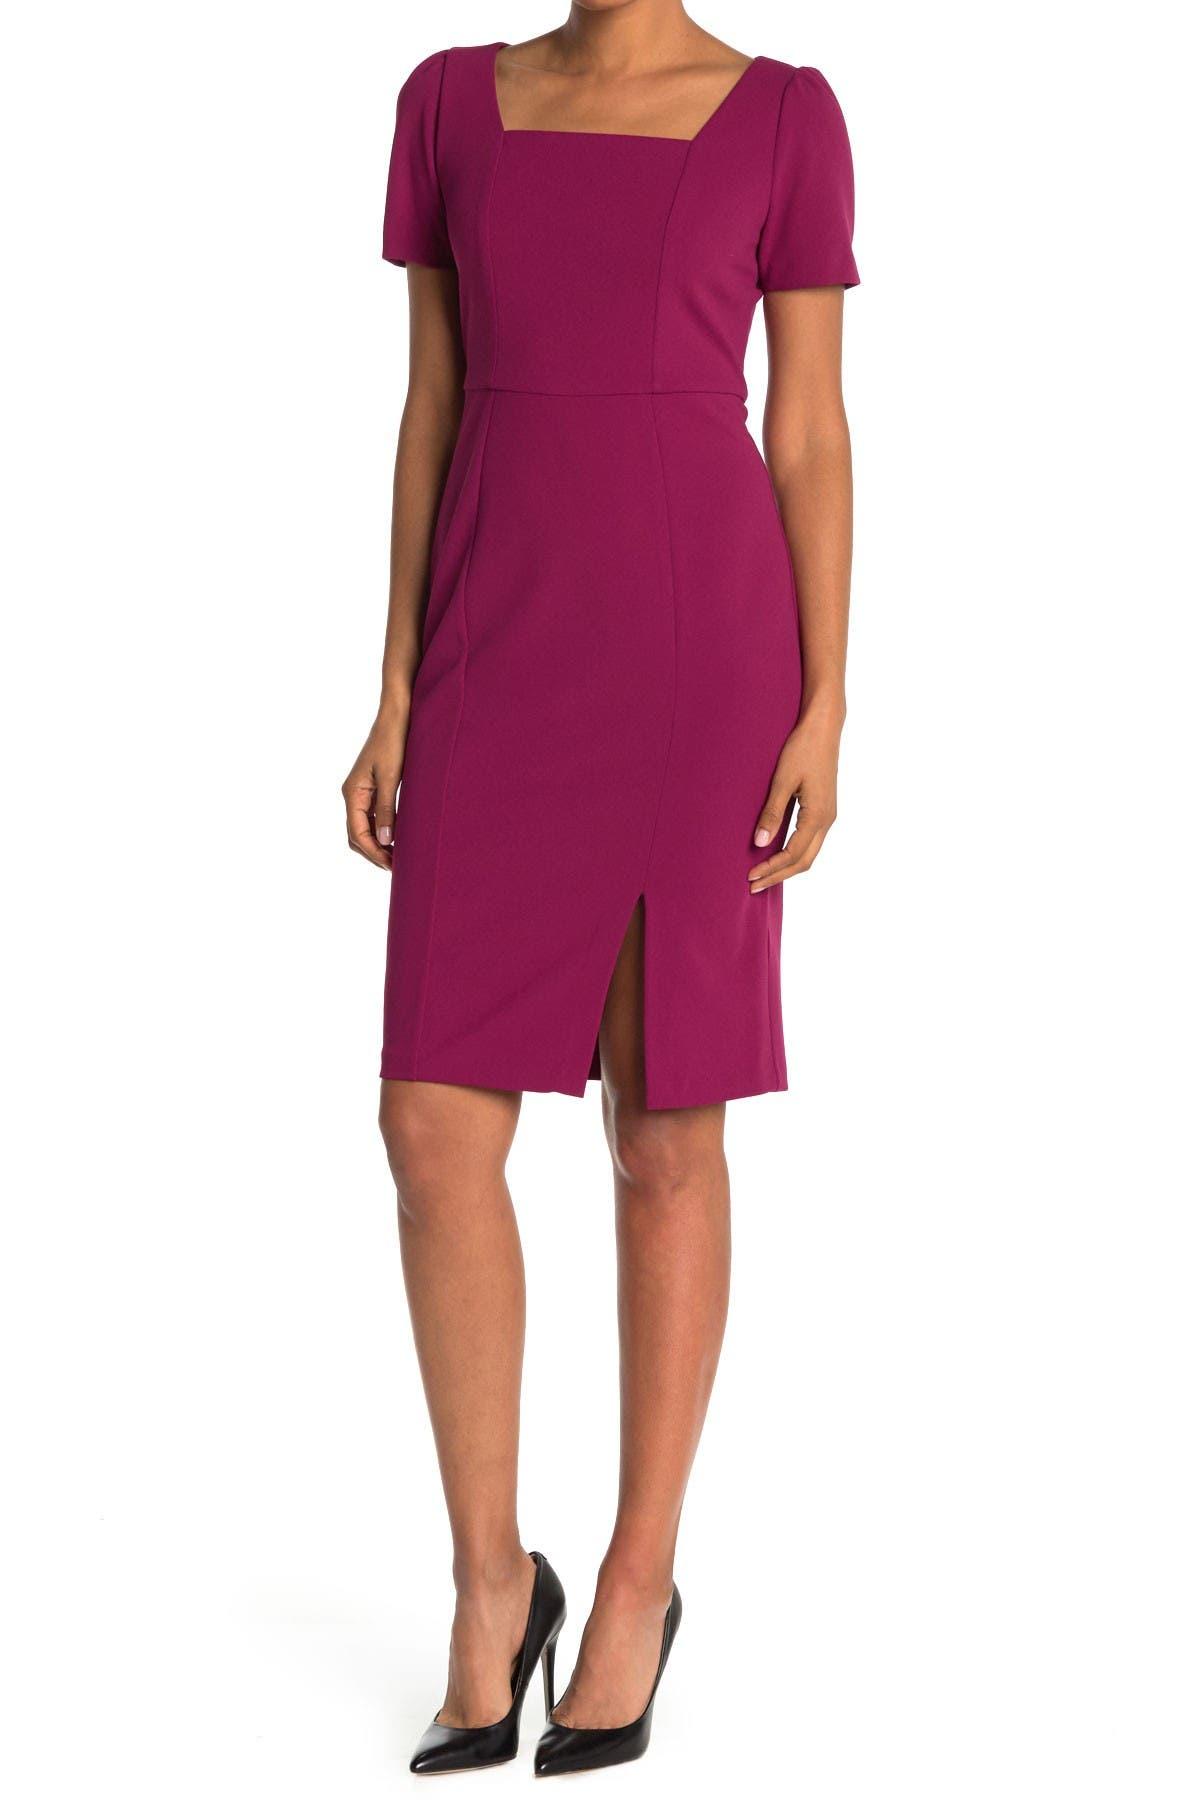 Image of London Times Scruba Crepe Short Sleeve Midi Sheath Dress